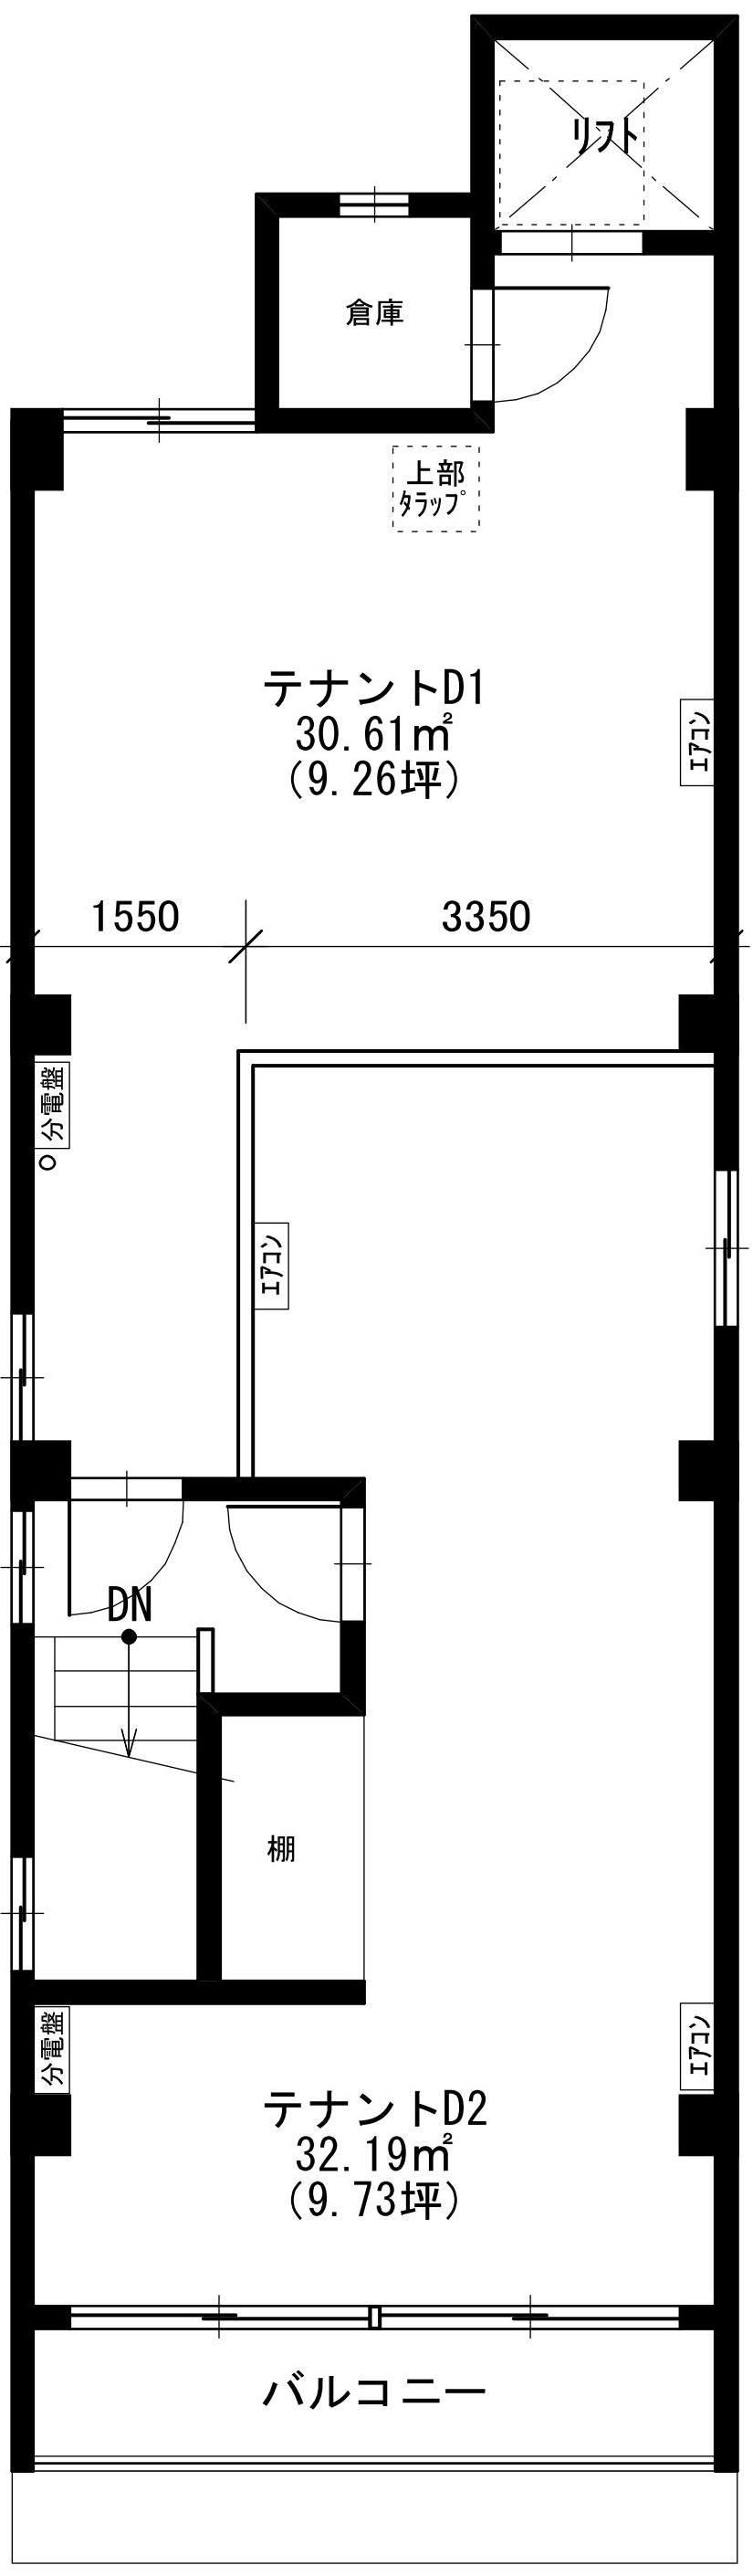 The Office葵 4階平面図161121(HP用)_201703-13